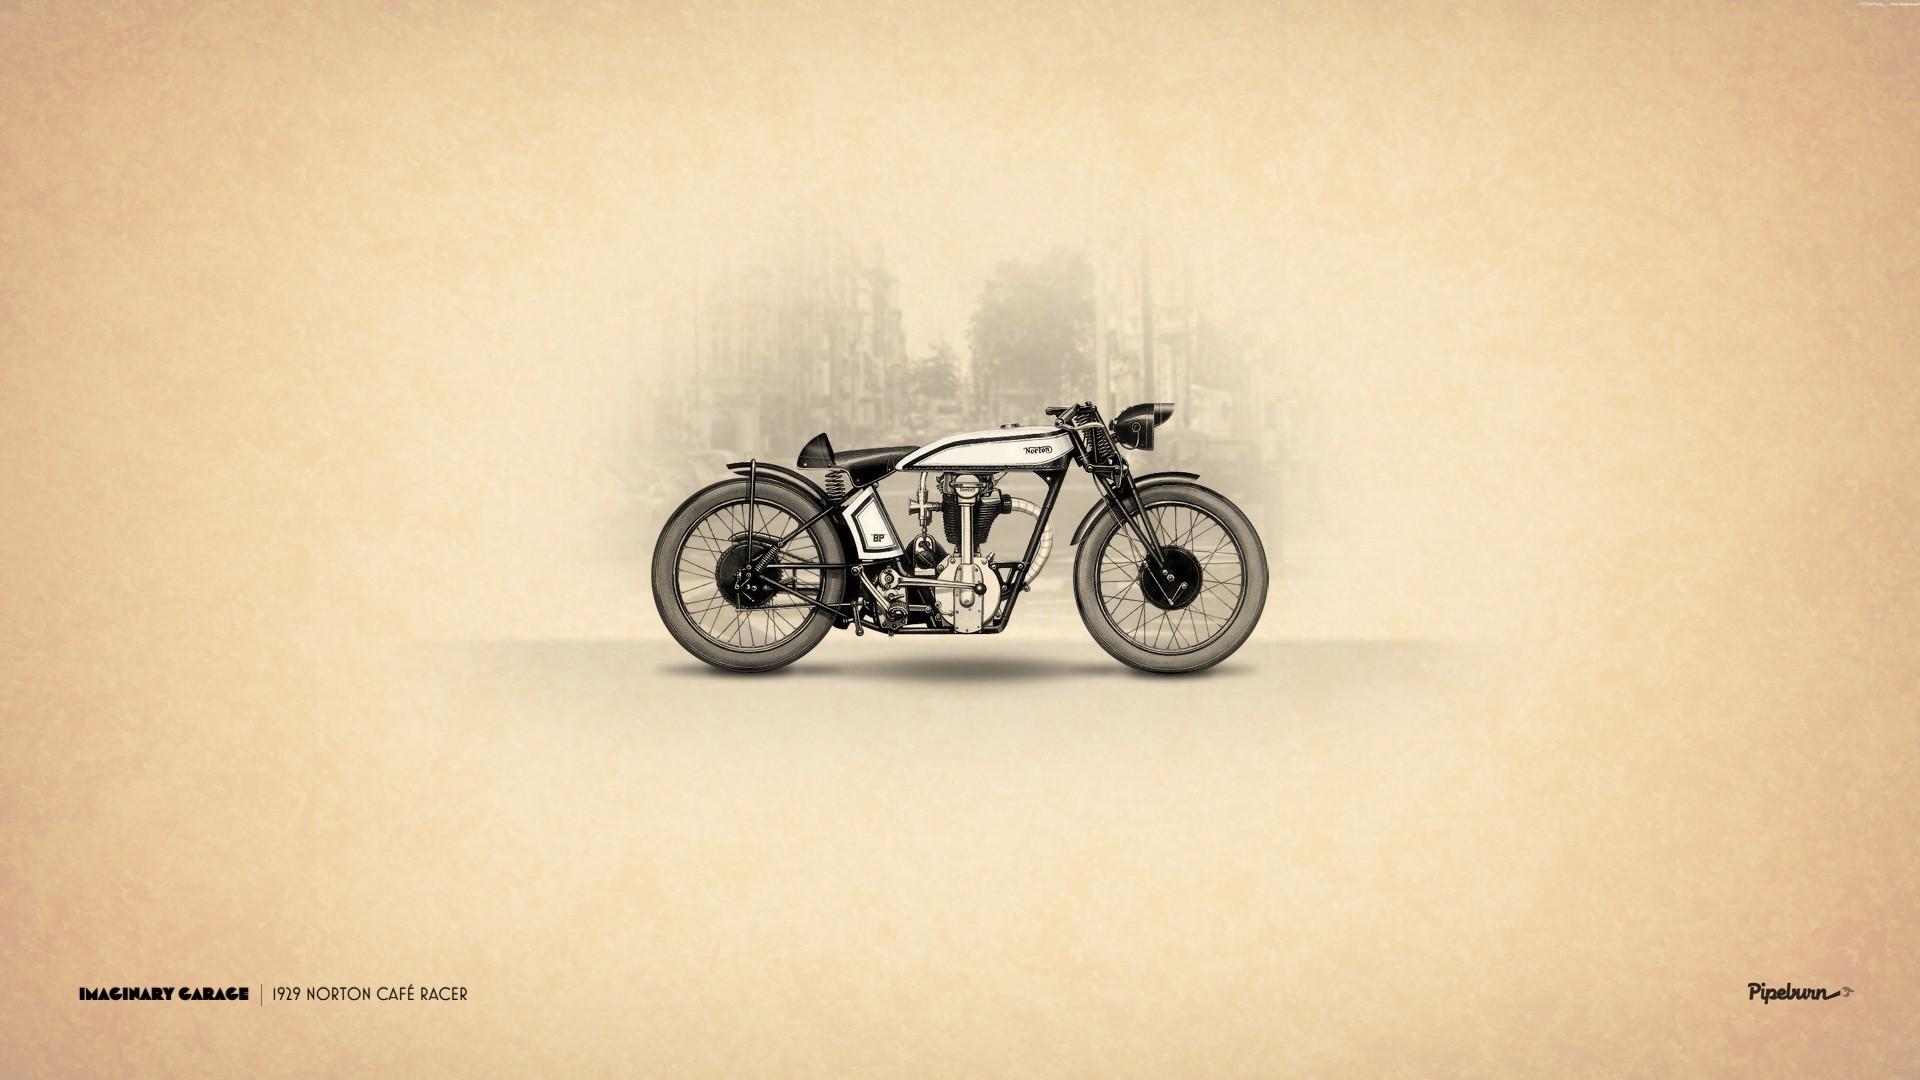 1929 Norton Cafe Racer Motorcycle wallpaper     103973    WallpaperUP